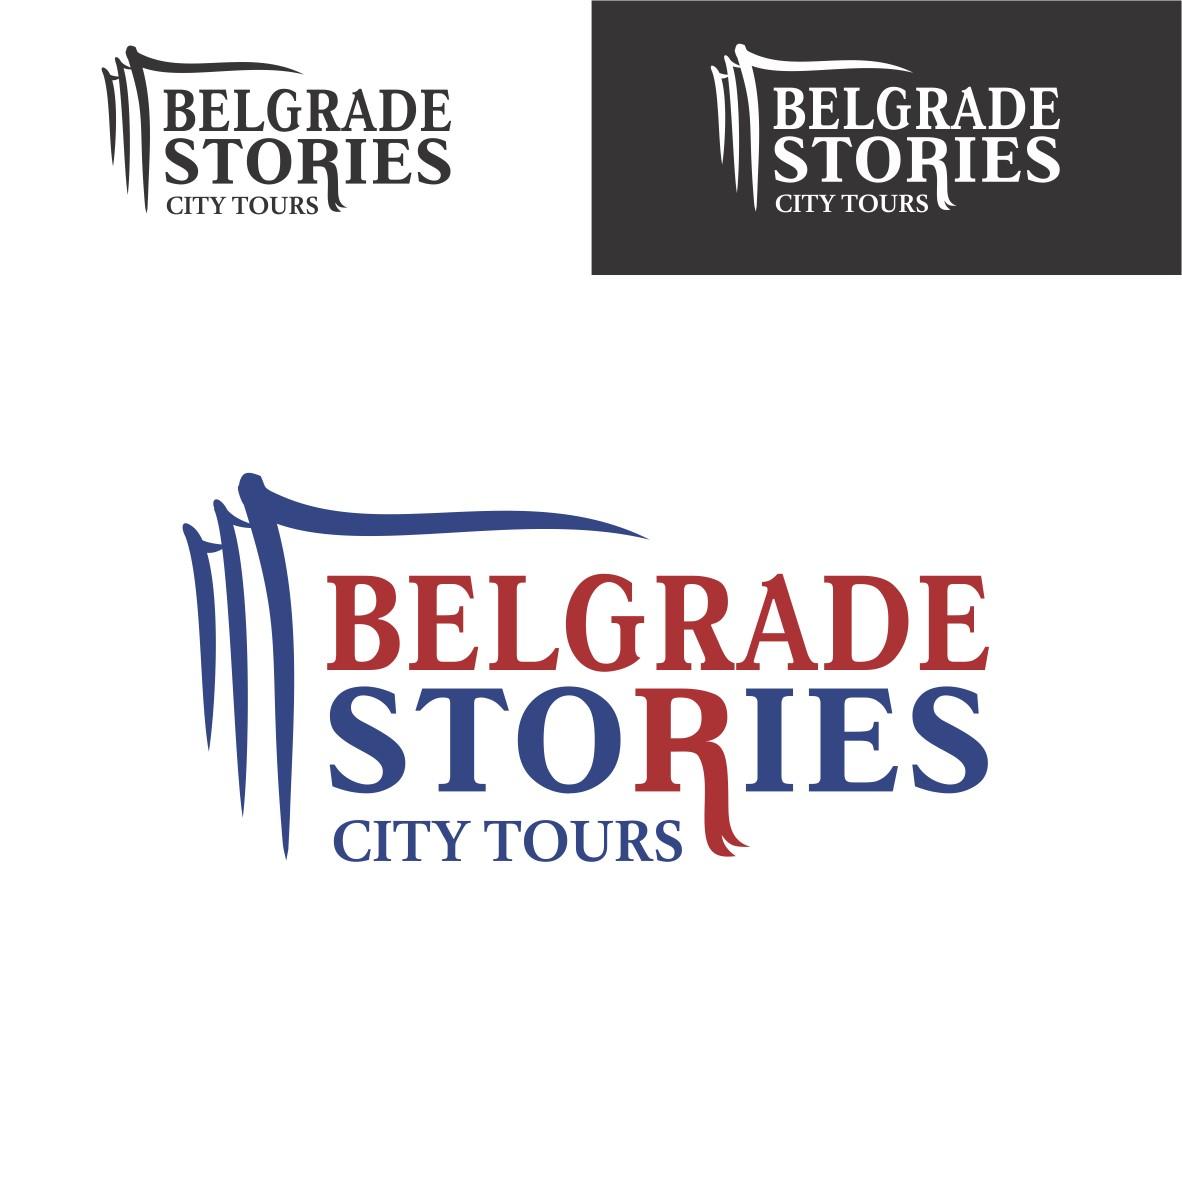 Логотип для агентства городских туров в Белграде фото f_9235891d92bb9a43.jpg